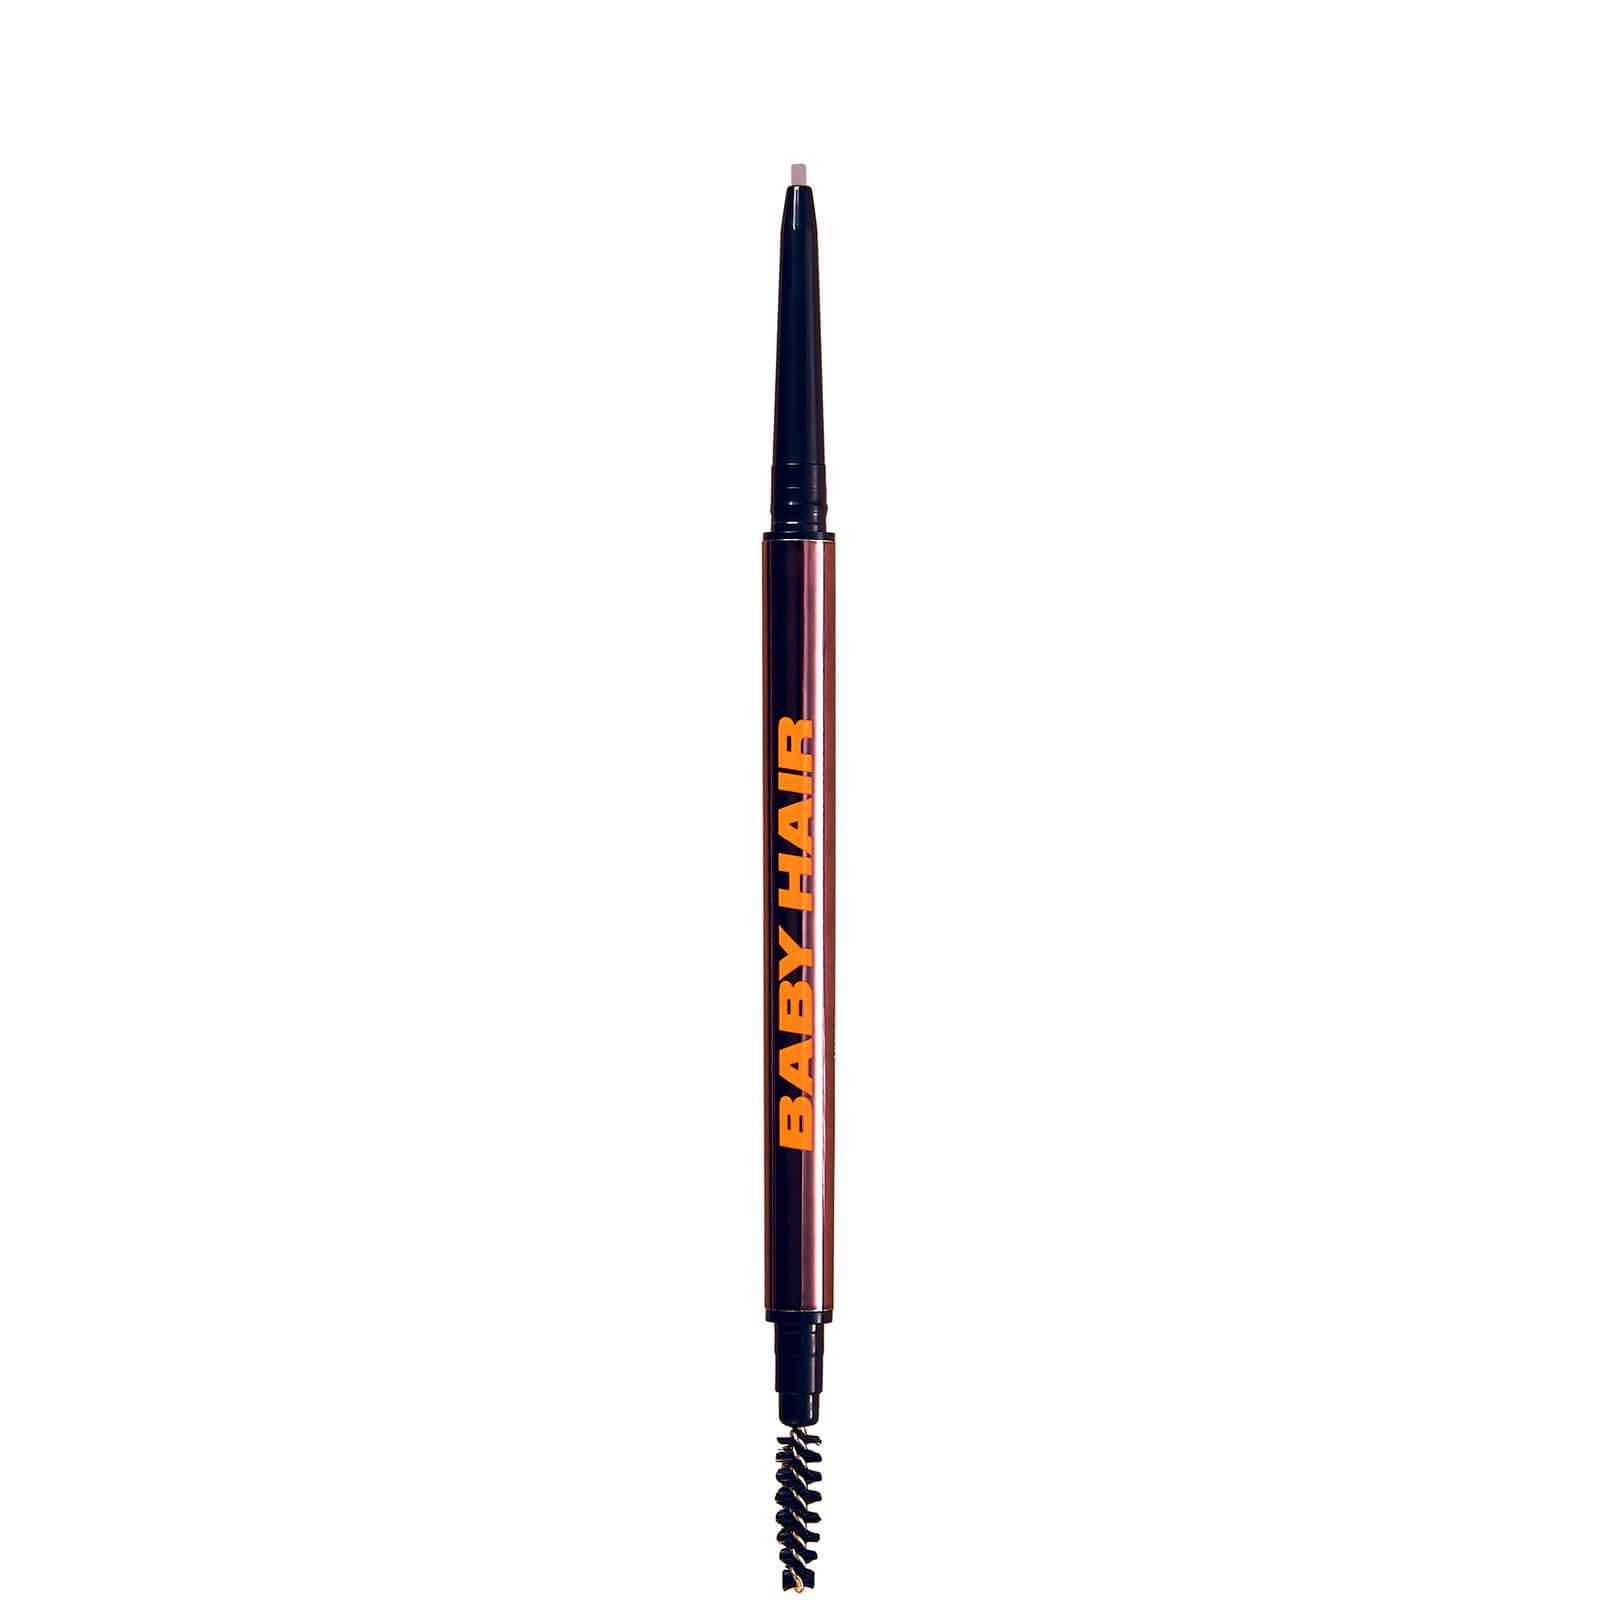 Купить UOMA Beauty Brow Fro Baby Hair Brow Pencil 5ml (Various Shades) - 1